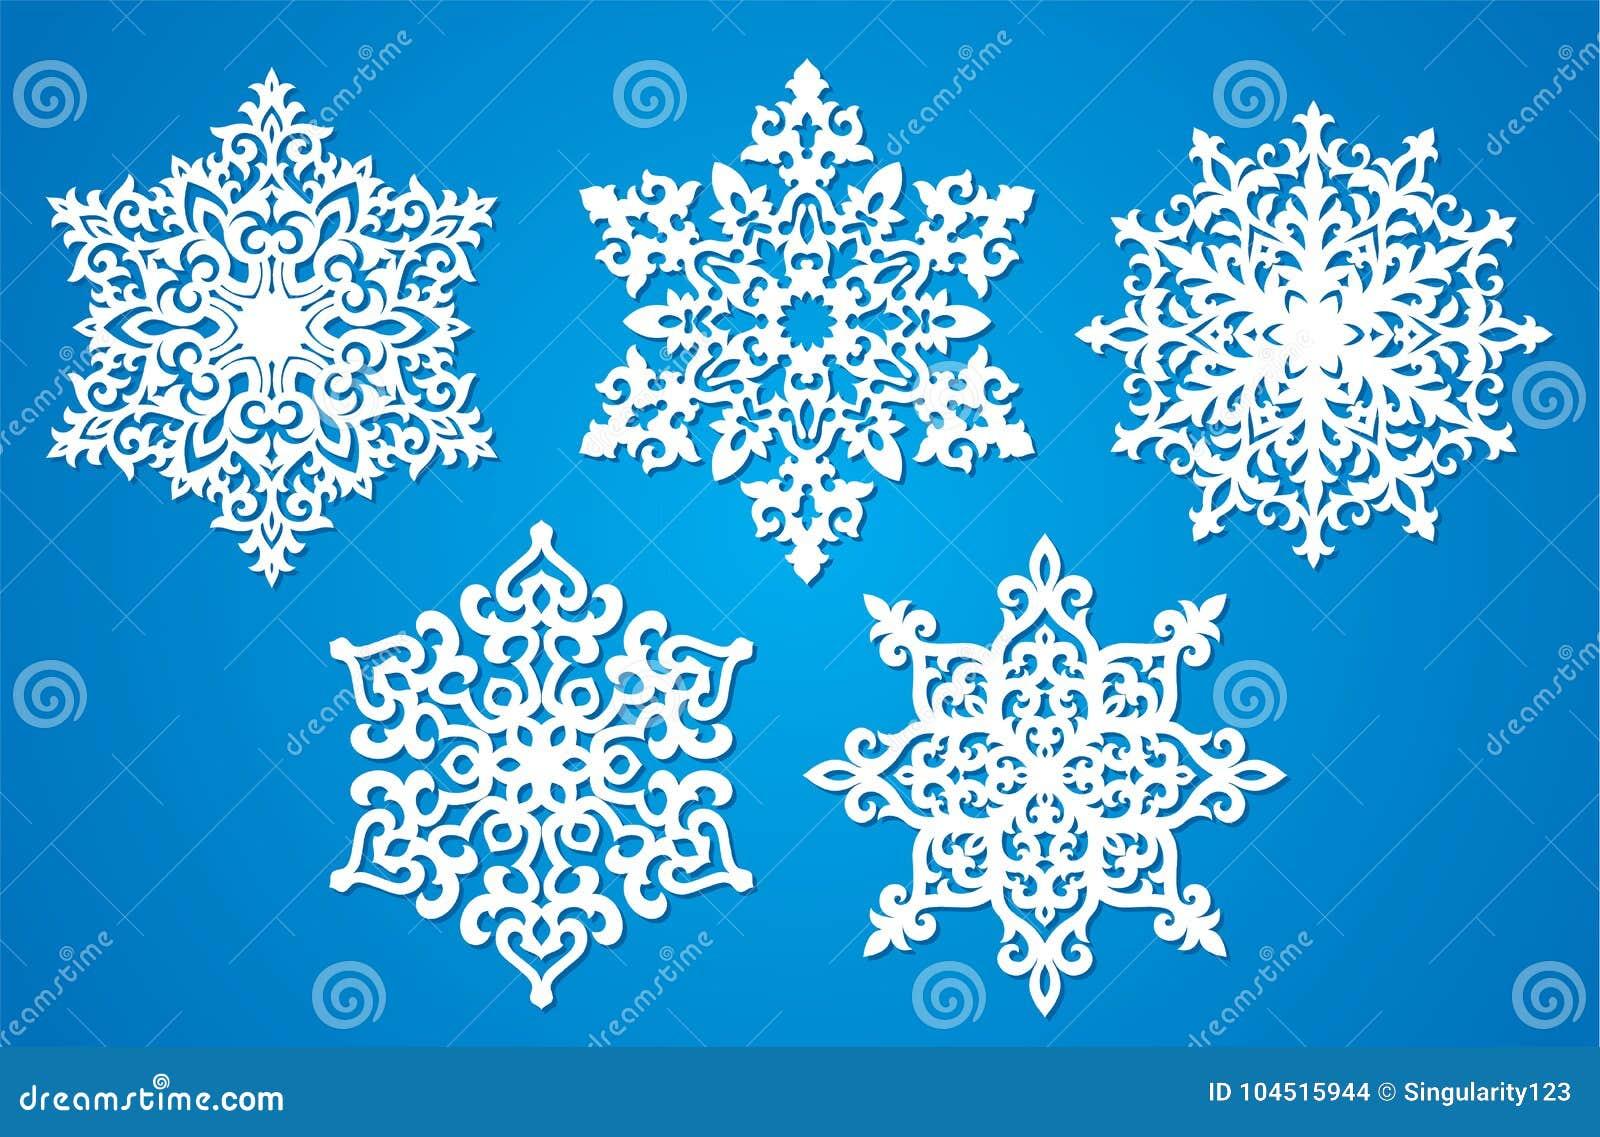 Christmas Cutout Patterns.Vector Snowflake Laser Cut Template Cutout Pattern Of